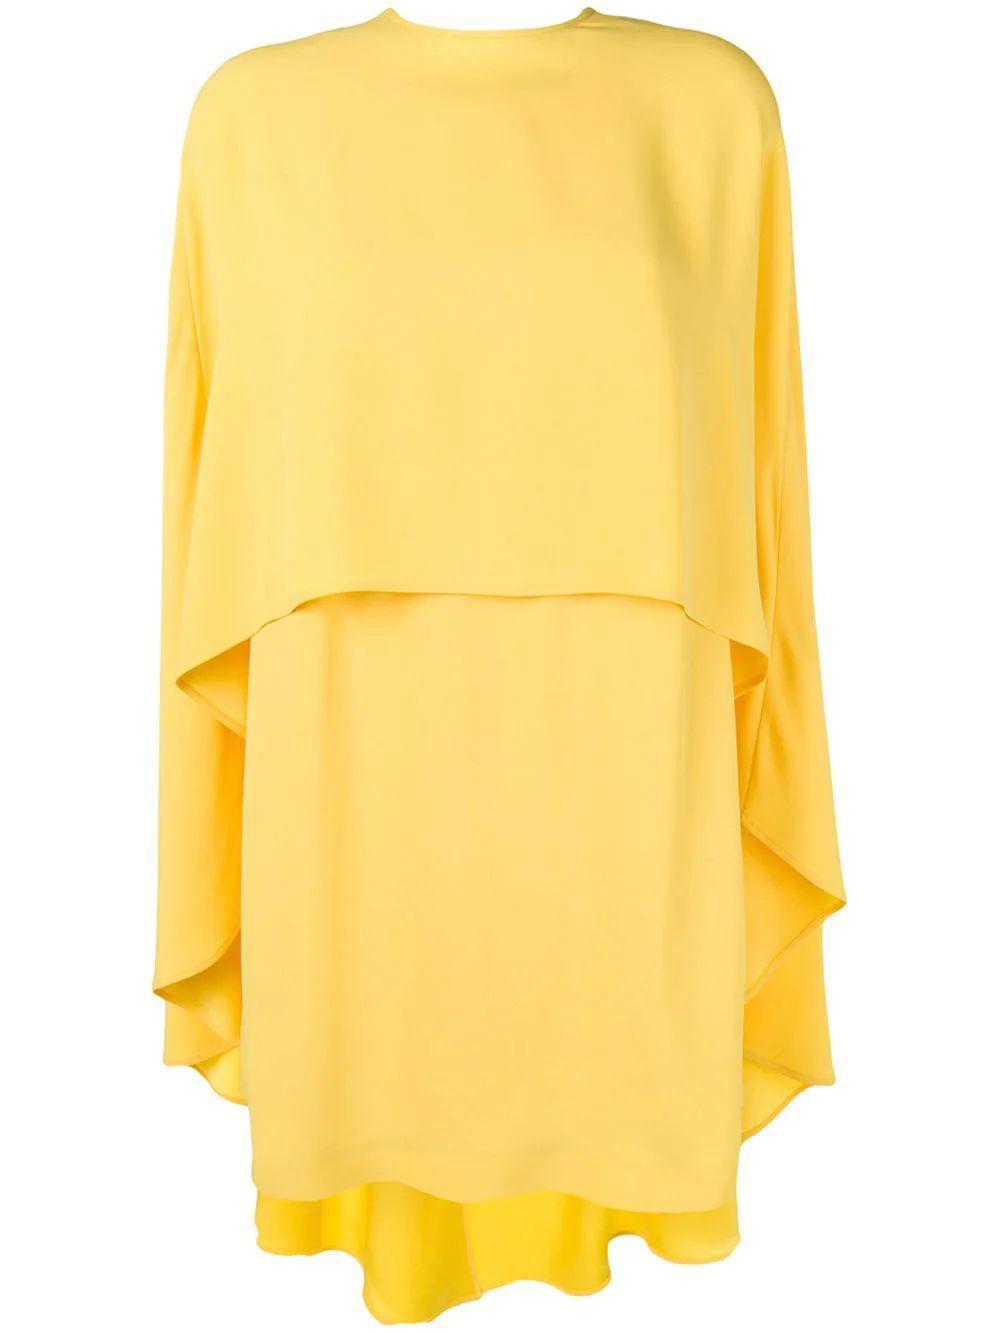 Halter Neck Dress W/Cape Item # SB5024-317